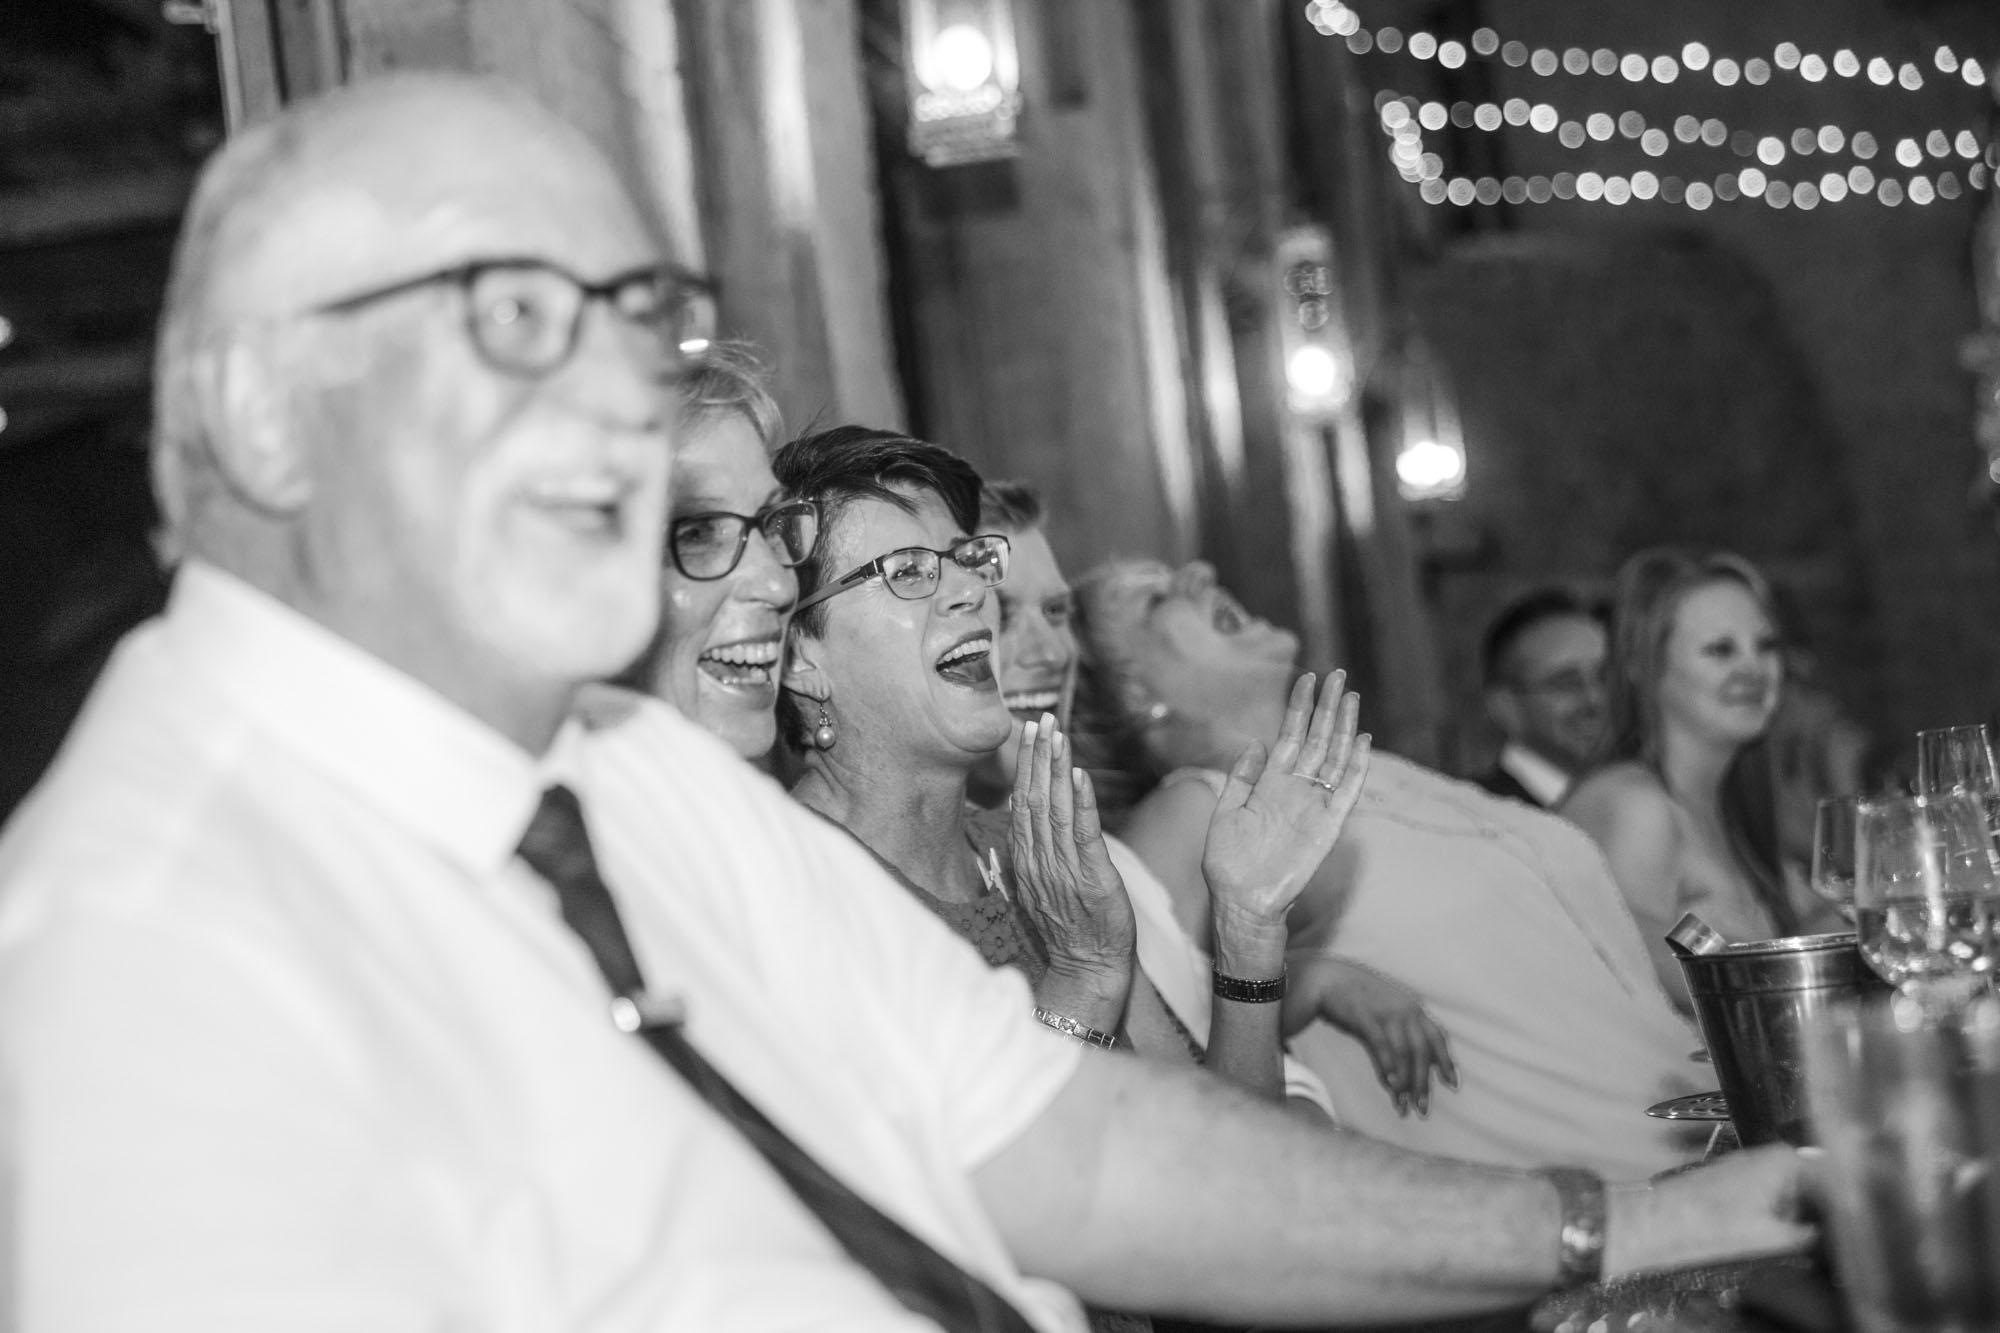 121-photojournalistic-wedding-photographers-johannesburg121-photojournalistic-wedding-photographers-johannesburg_a.jpg